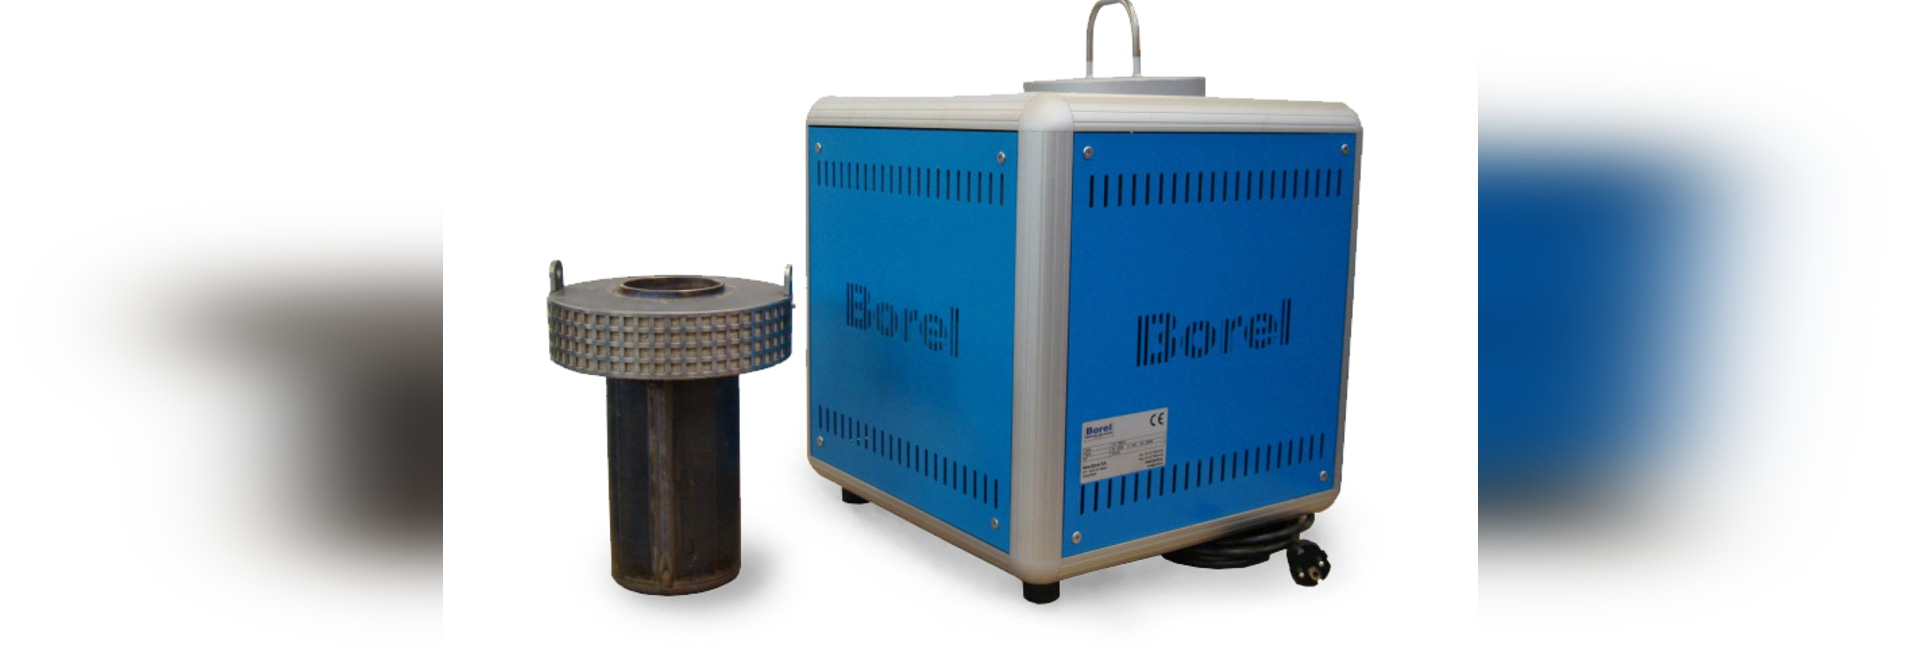 CU 1050-SE del horno del baño de la sal del cubo